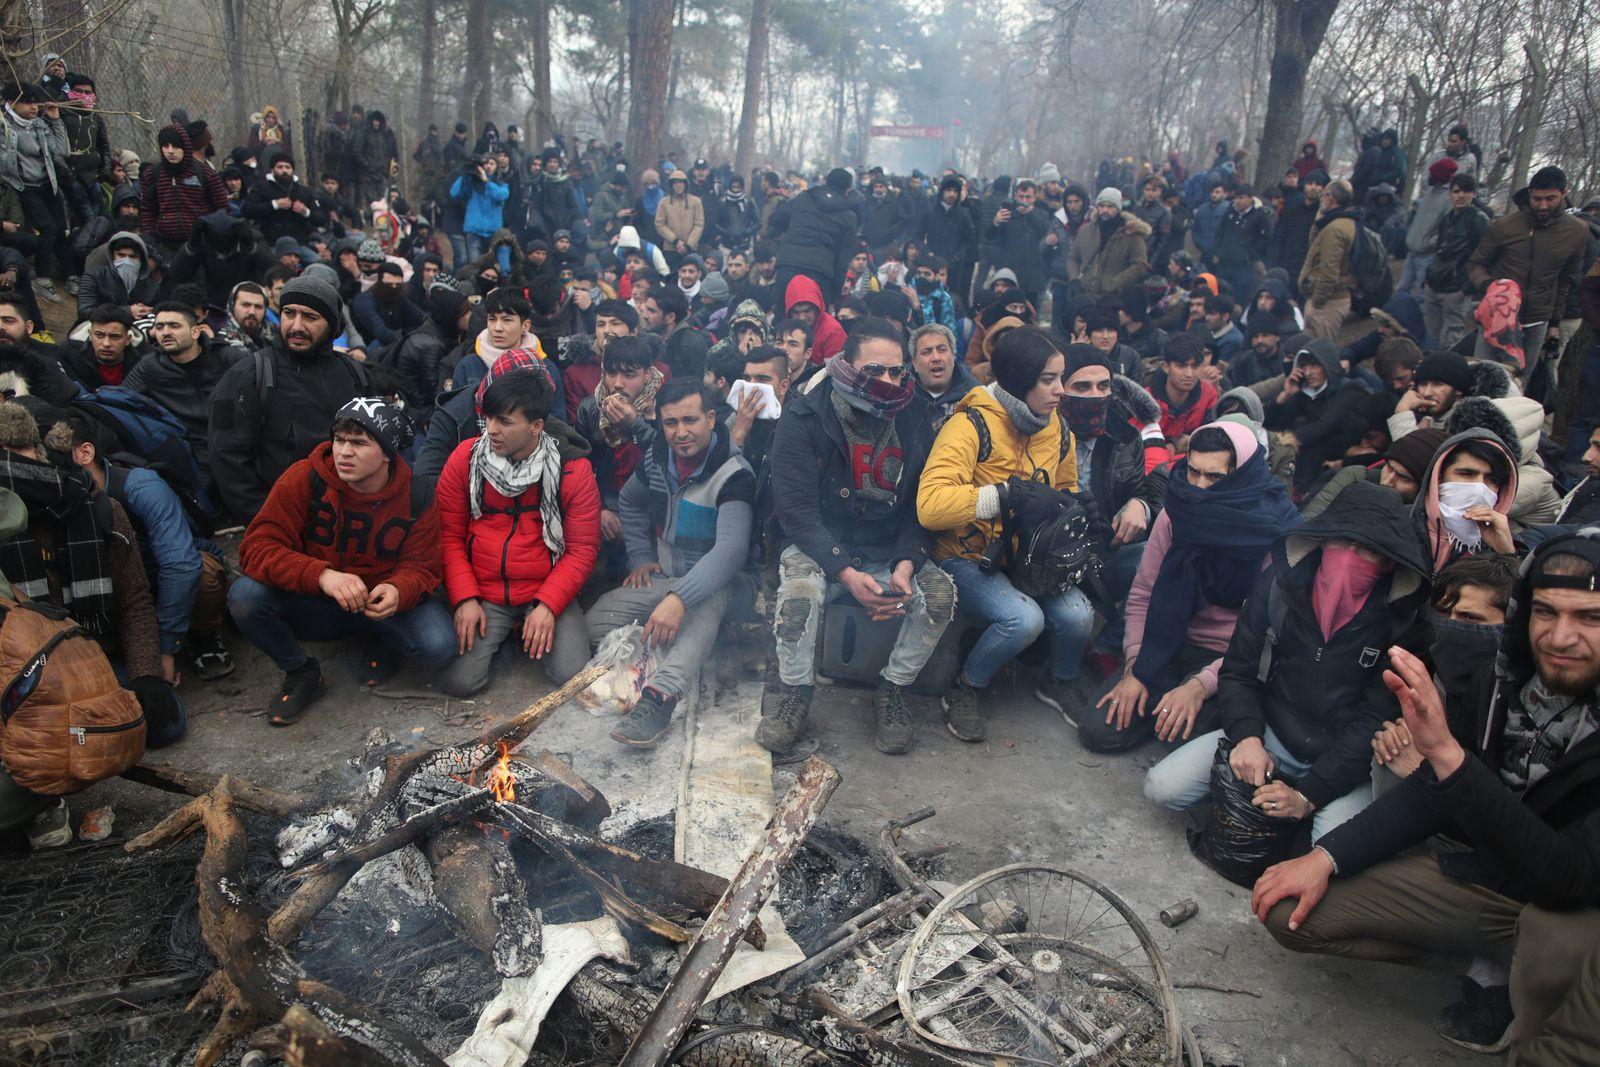 Refugees try to reach Europe, Edirne, Turkey - 29 Feb 2020